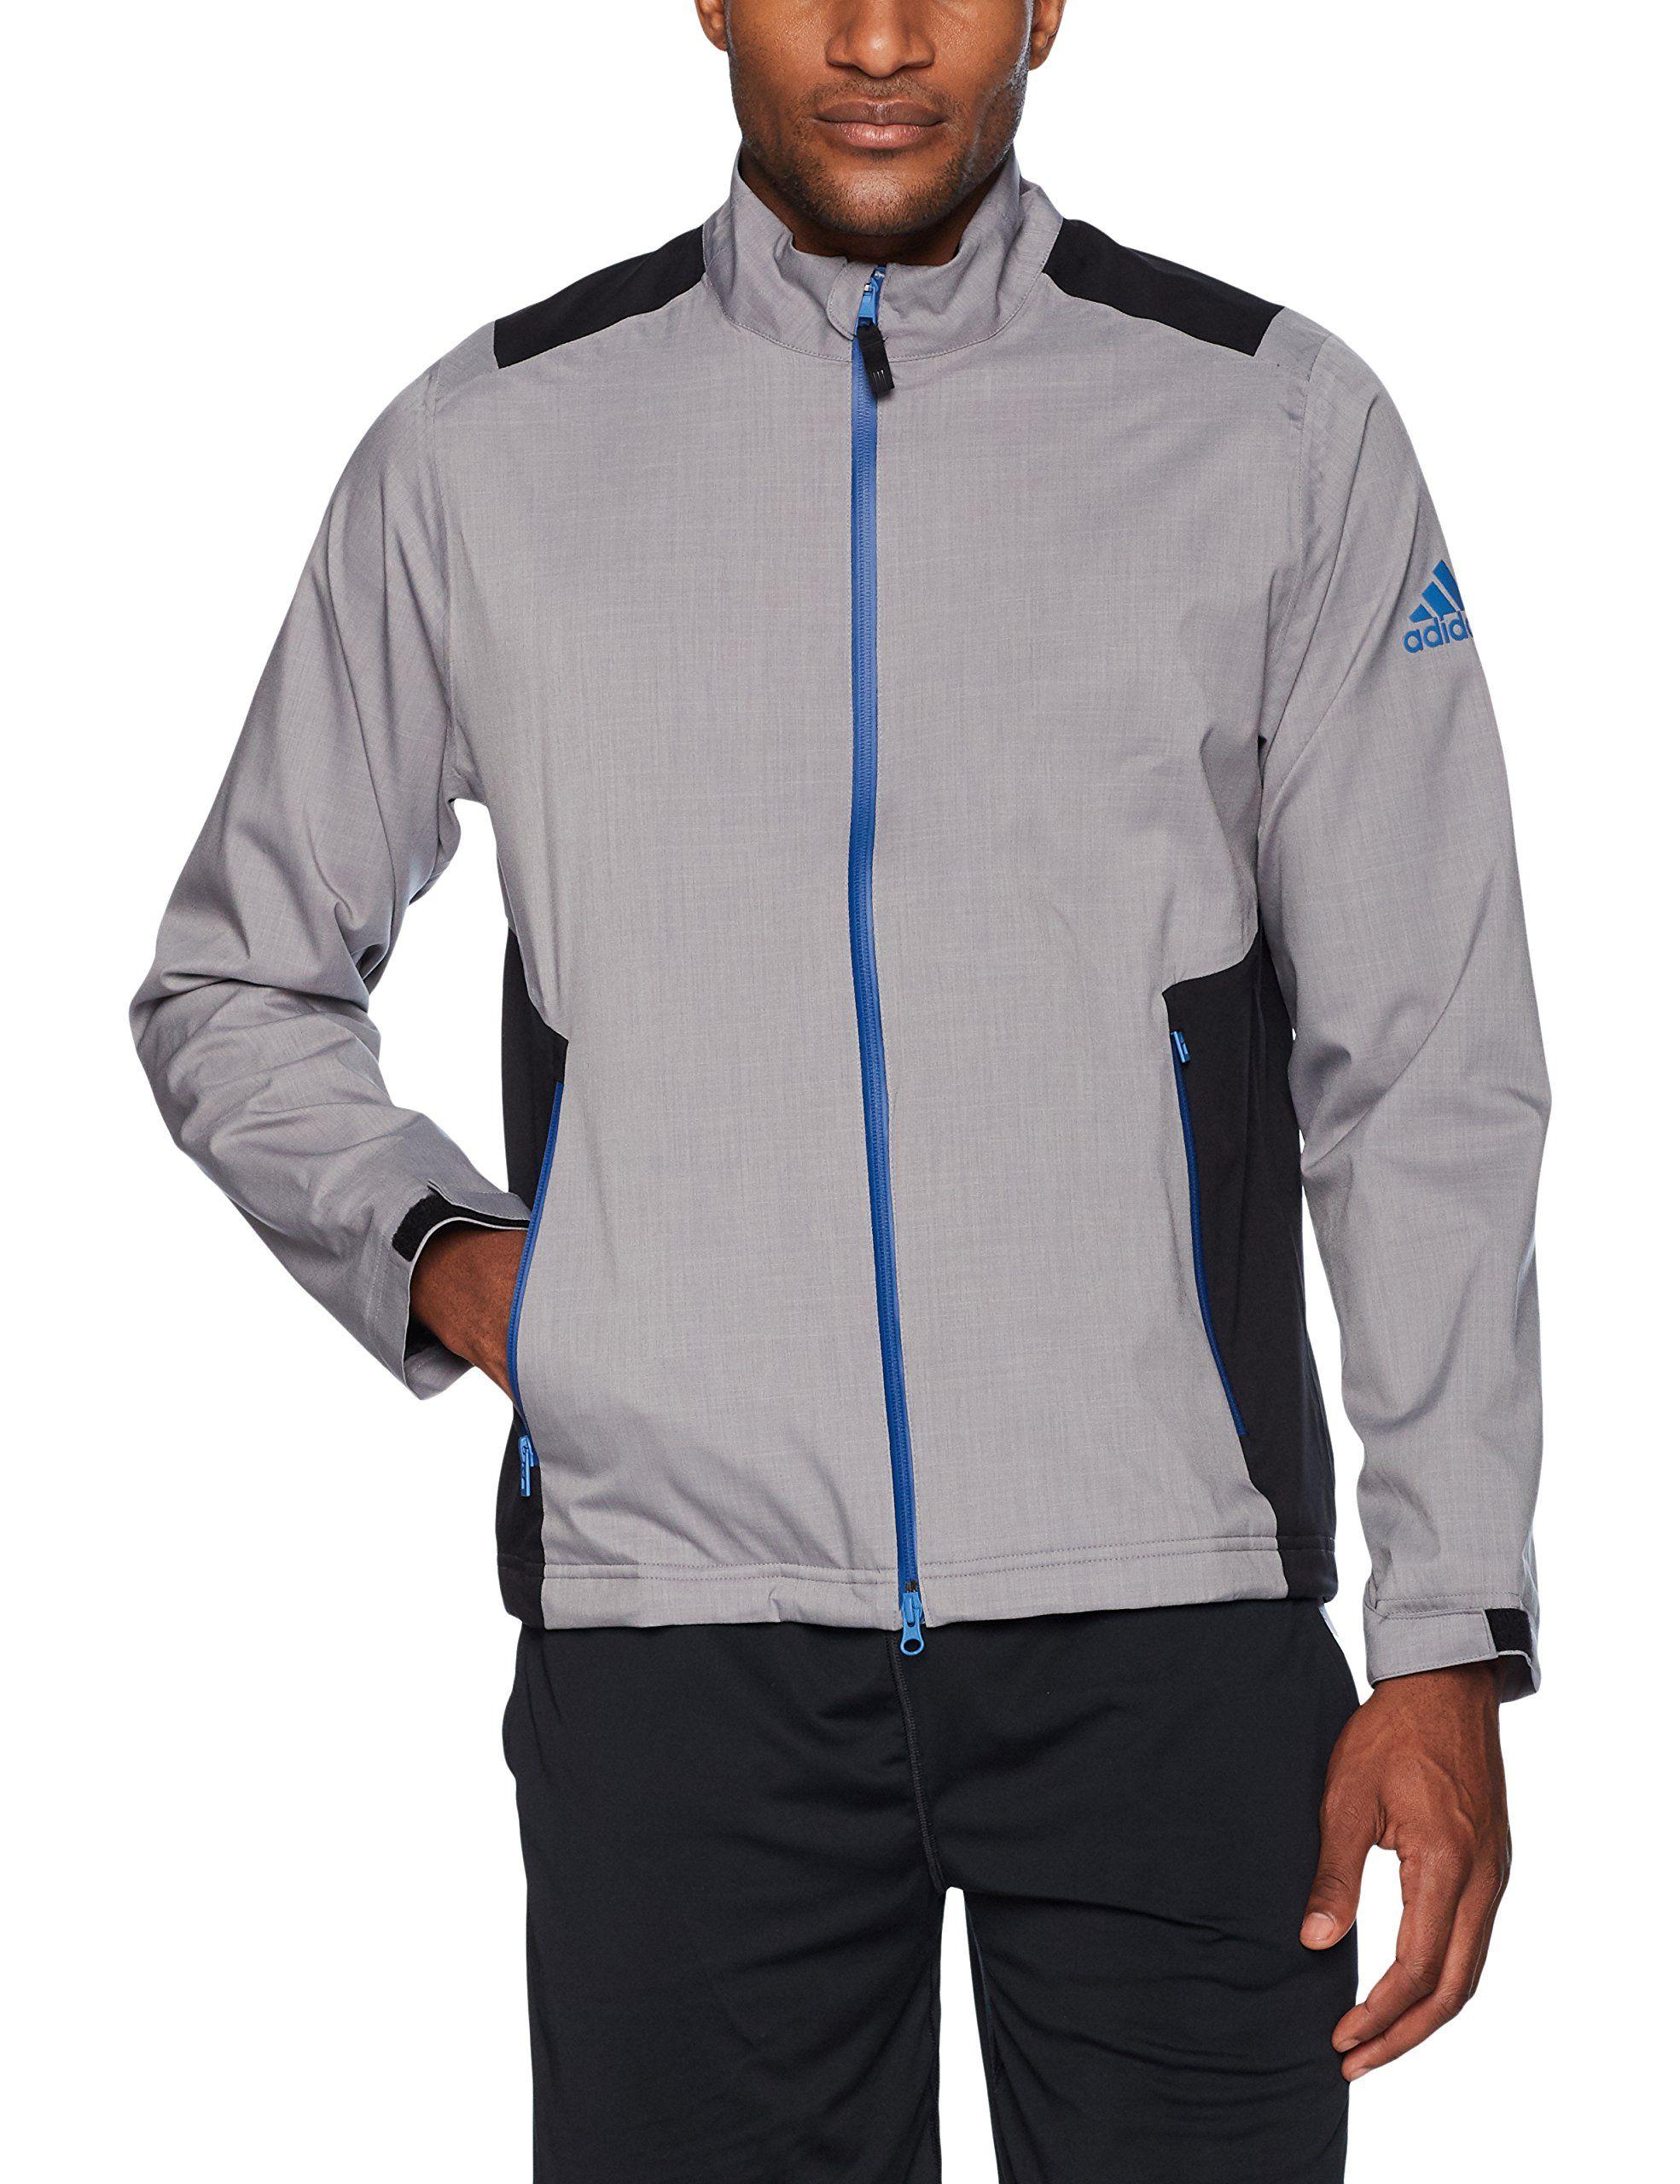 Men Golf Clothing Adidas Golf Mens Climaproof Heather Rain Jacket Grey Three F Grey Two F Black Night Grey Mens Golf Outfit Black Shorts Men Mens Rain Jacket [ 2560 x 1969 Pixel ]